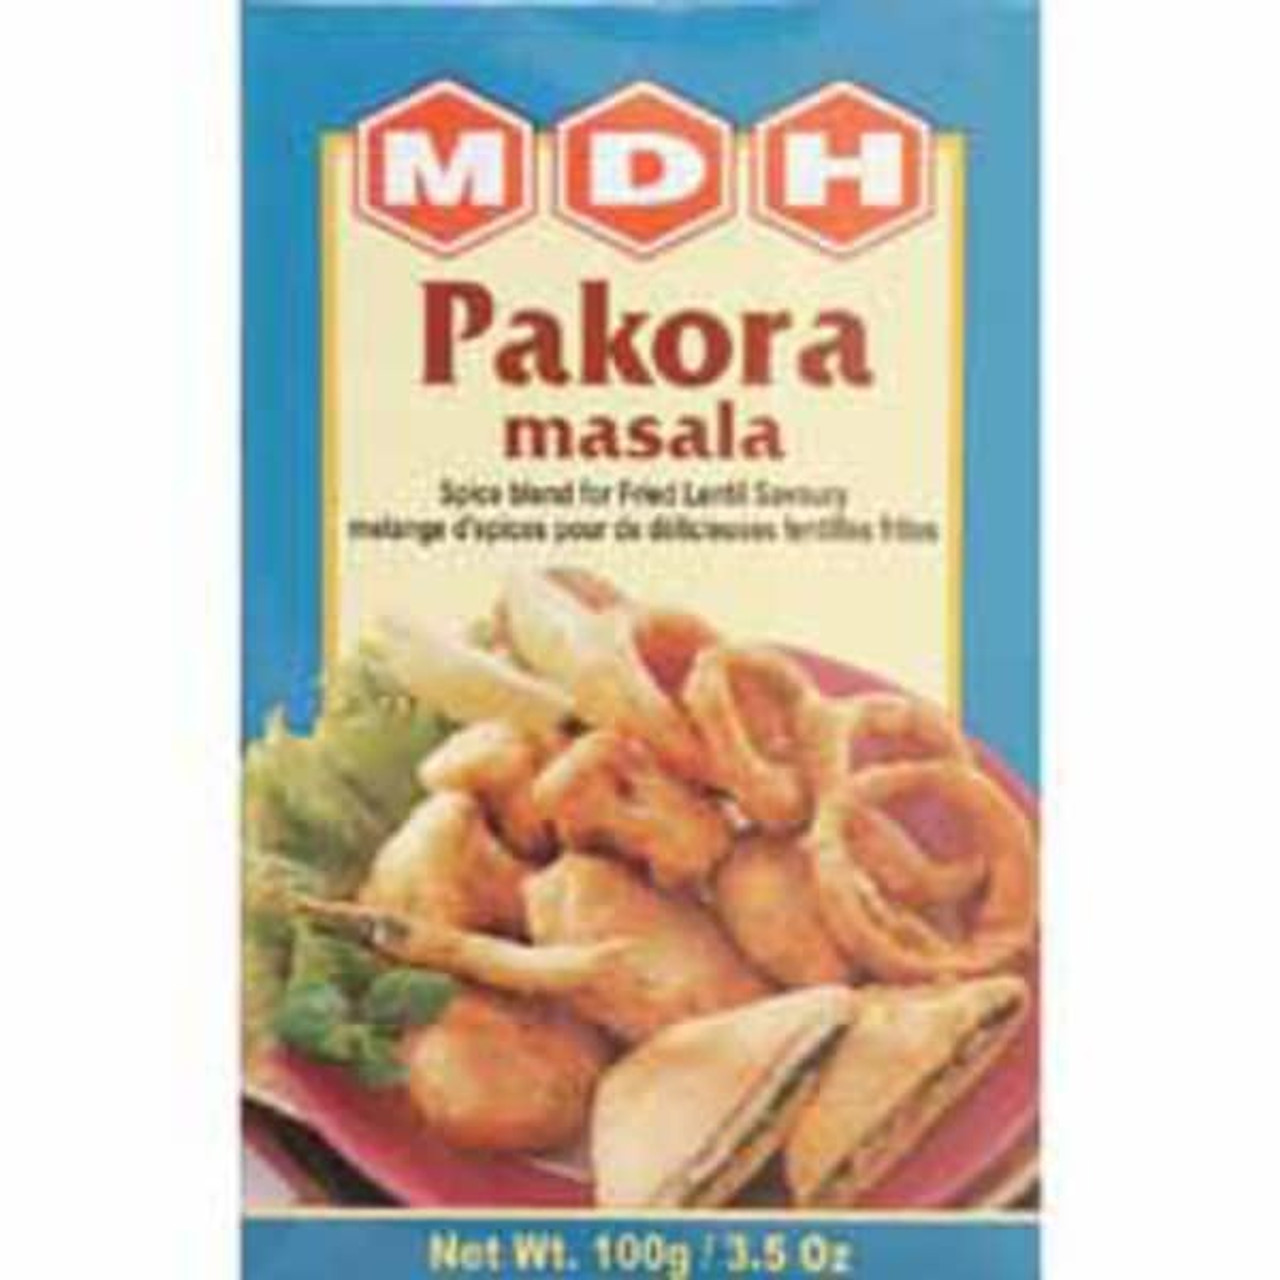 MDH Pakora Masala - 100g